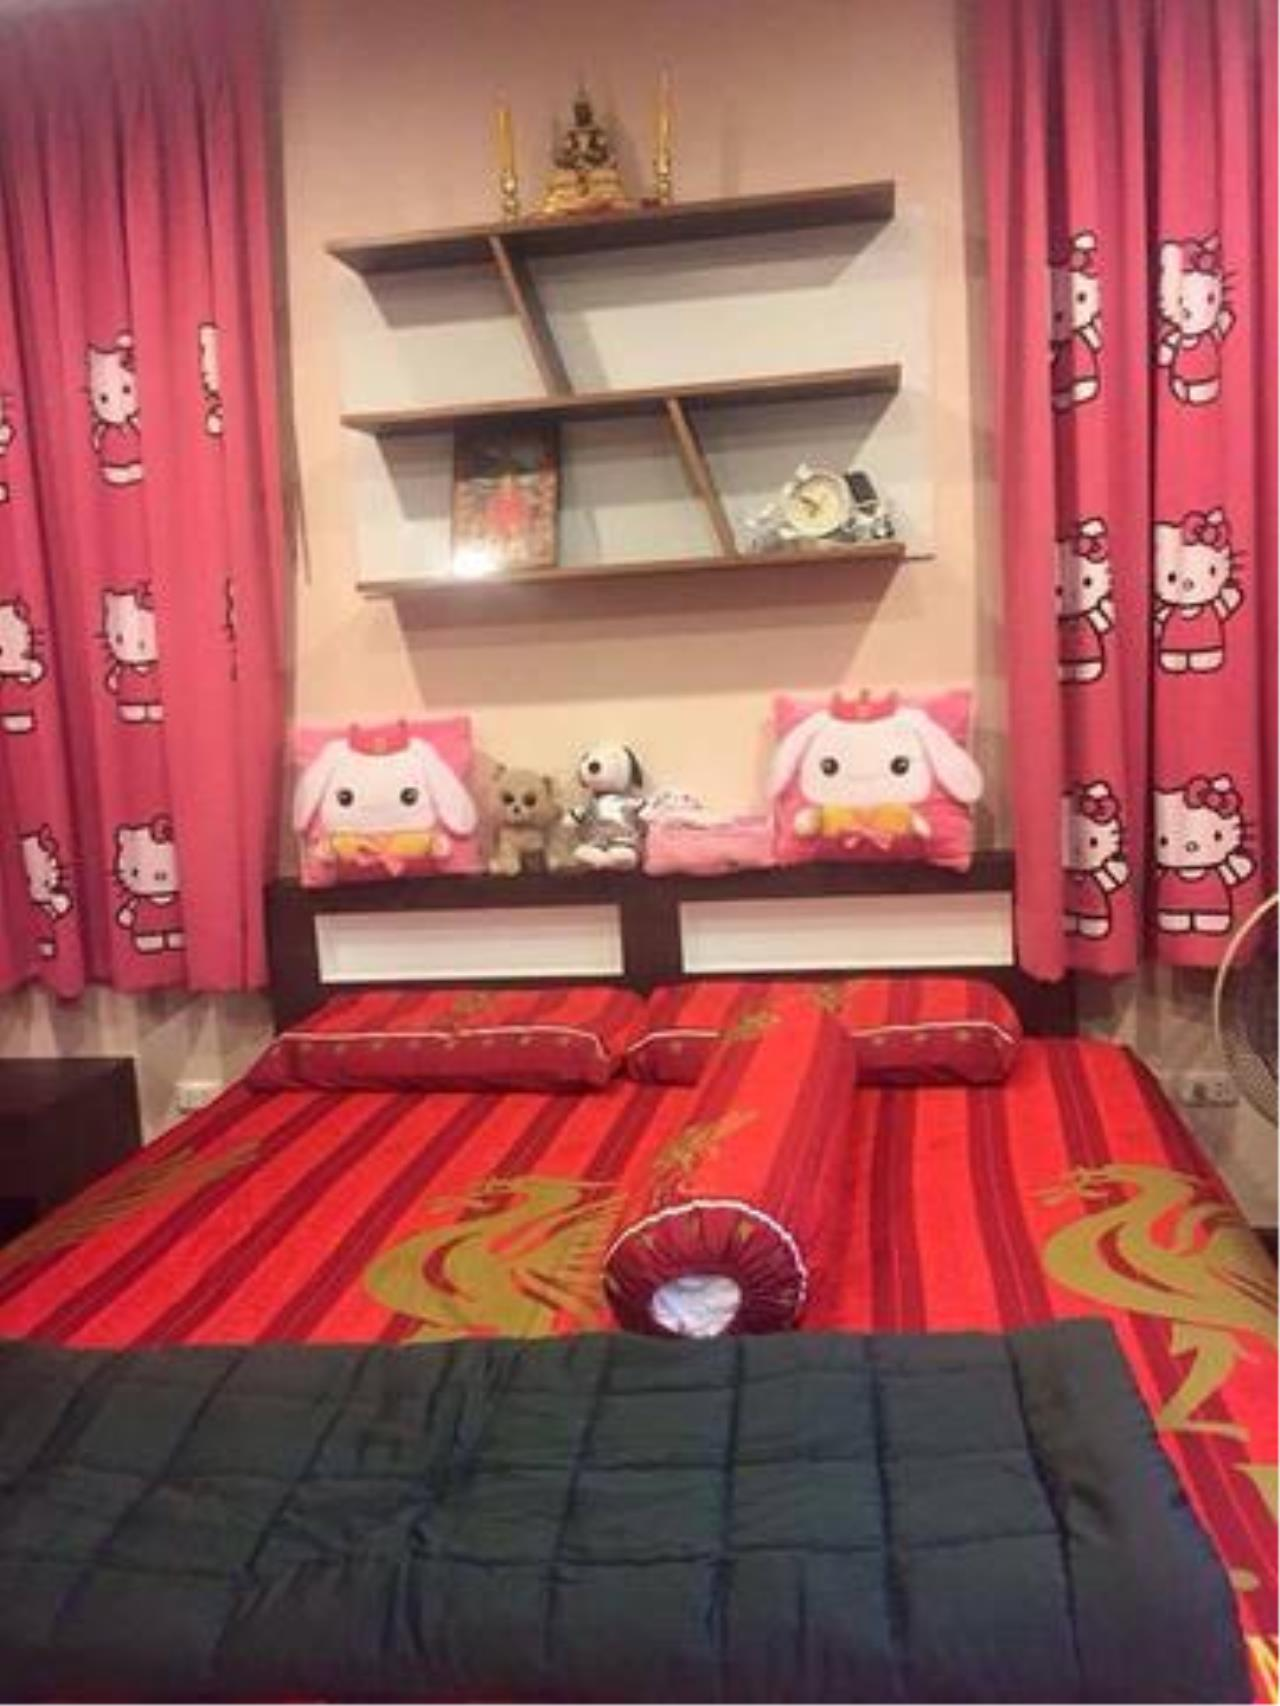 You Estate Agency's sale 2 bed 105 sq.m Supalai premier Ratchathewi 5